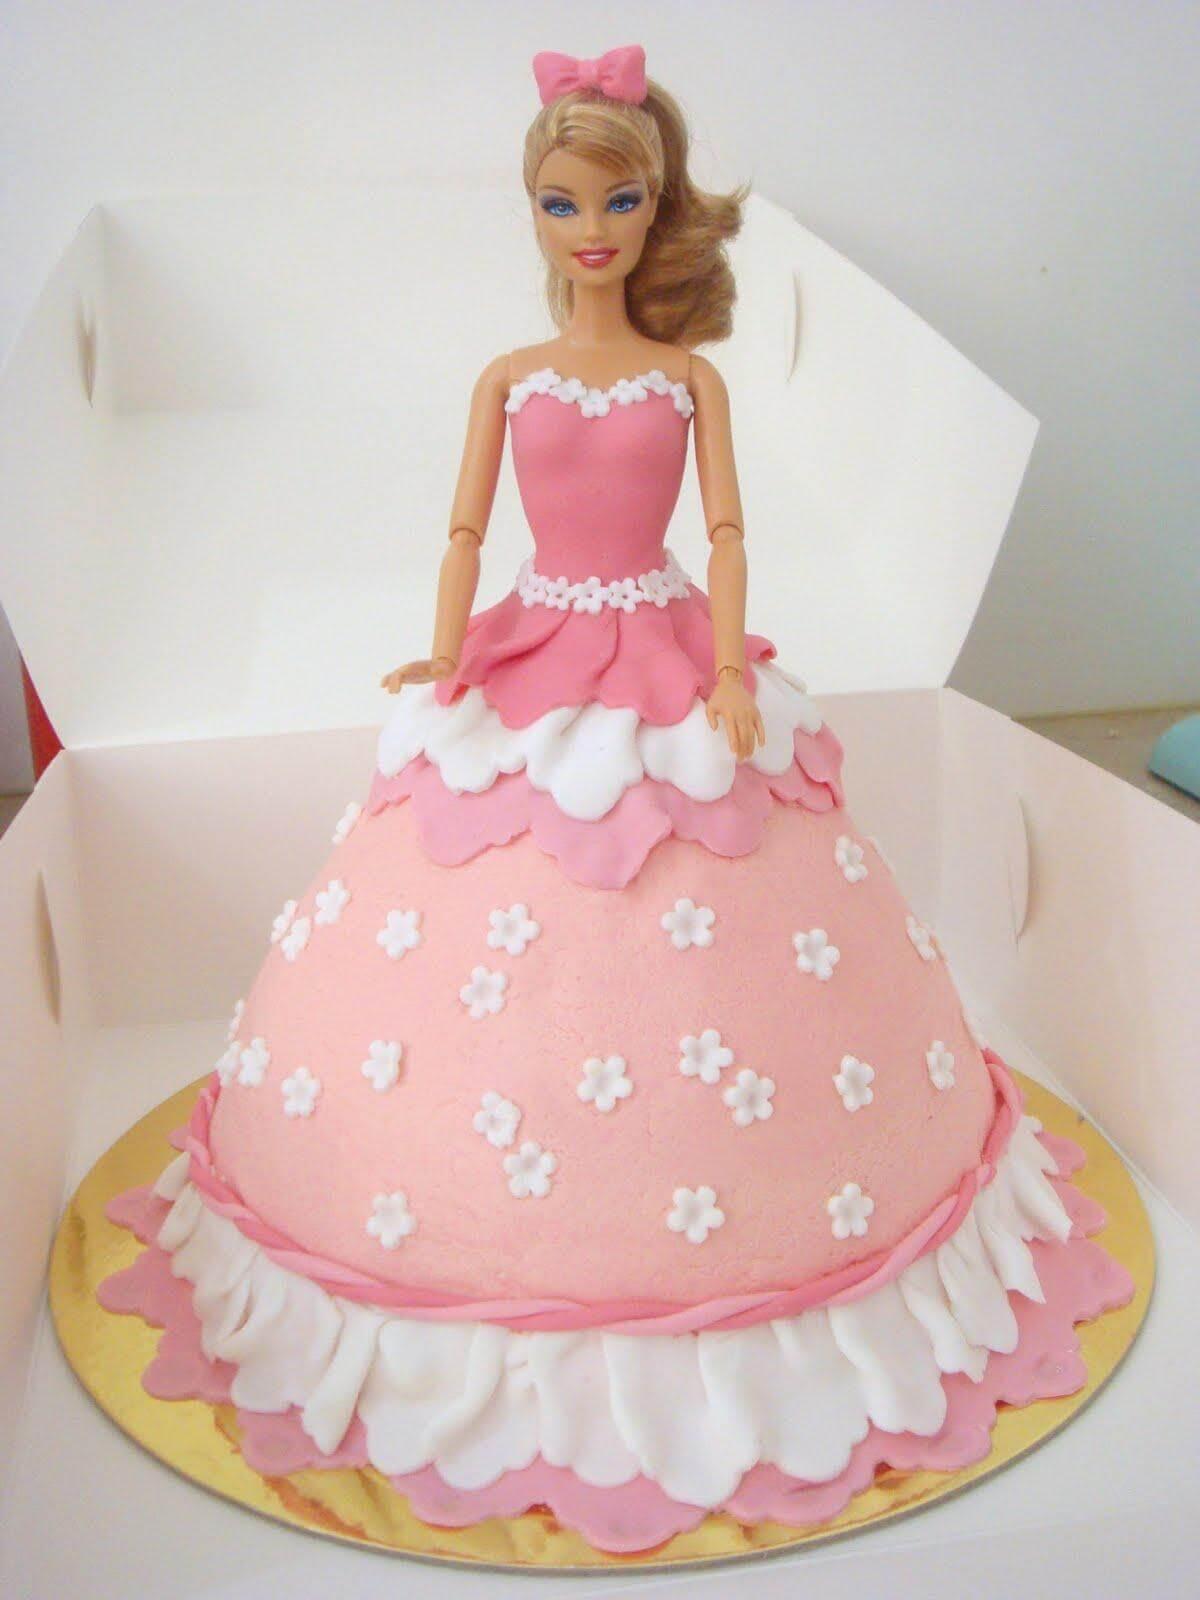 Barbie Cakes Design Cartoon